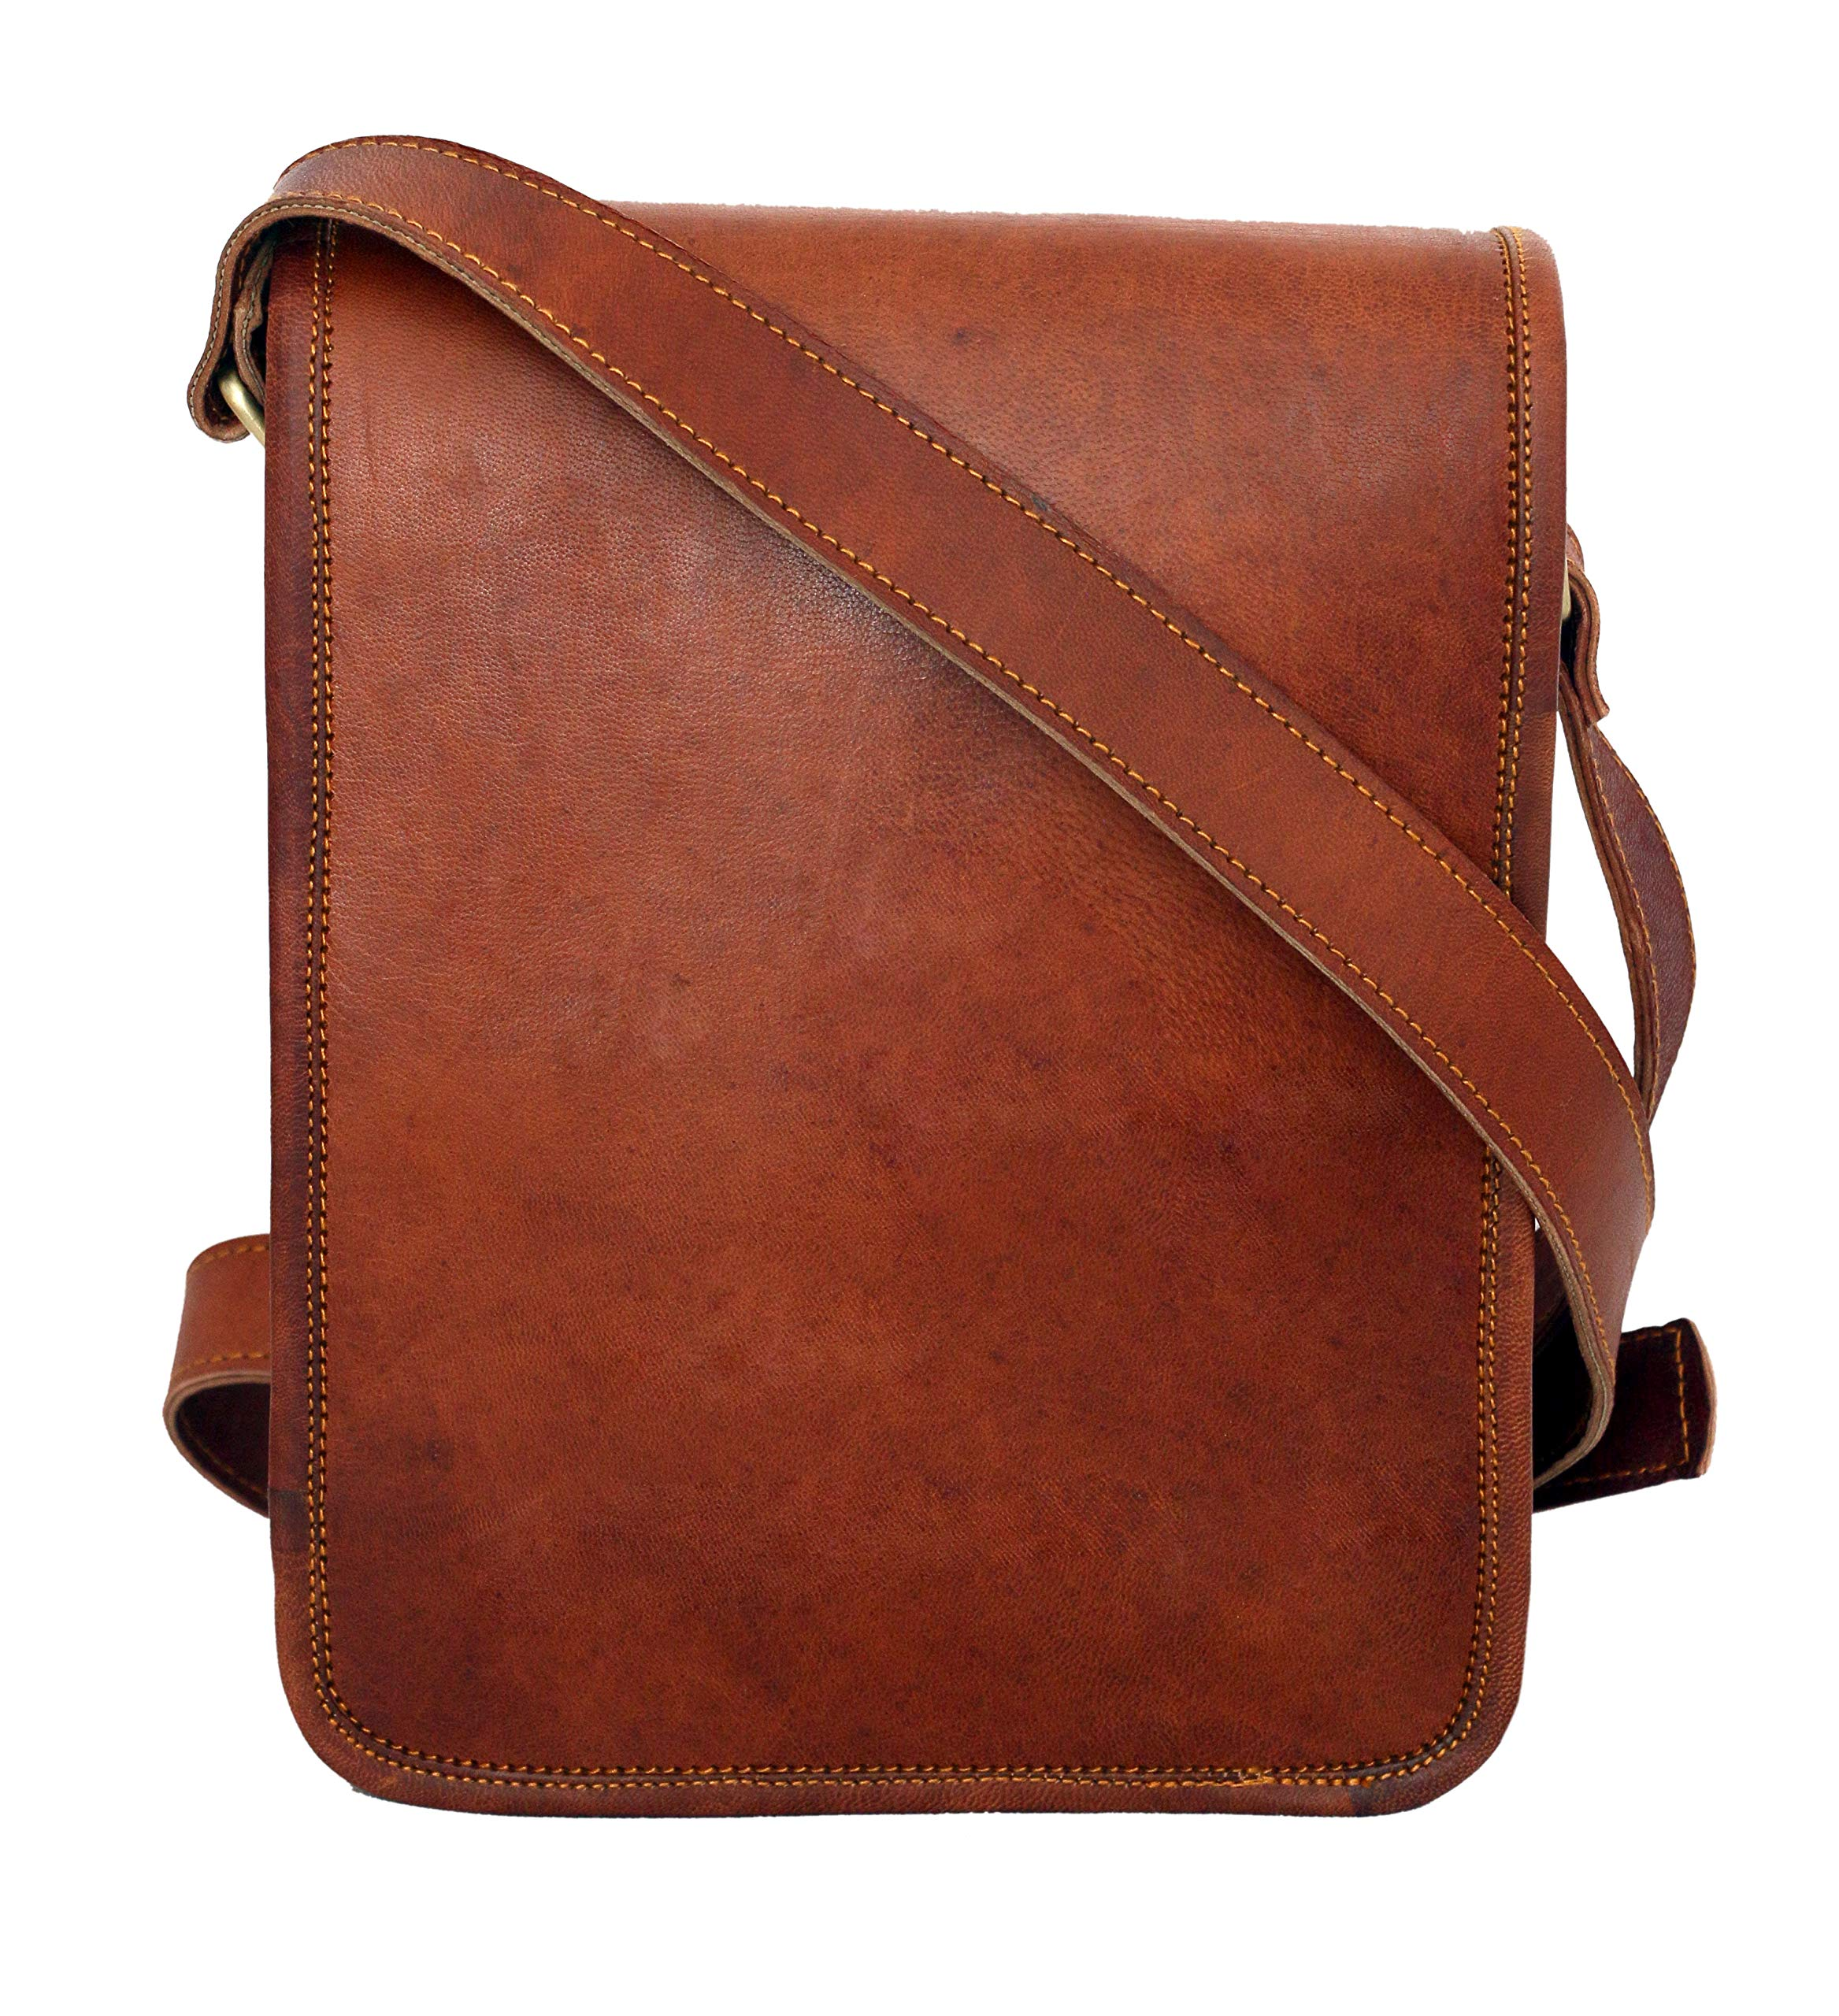 Leather bag Fair Deal / cross body bad / I pad bag / unisex bag / travel bag / messenger bag / office bag /  School bag / brown bag